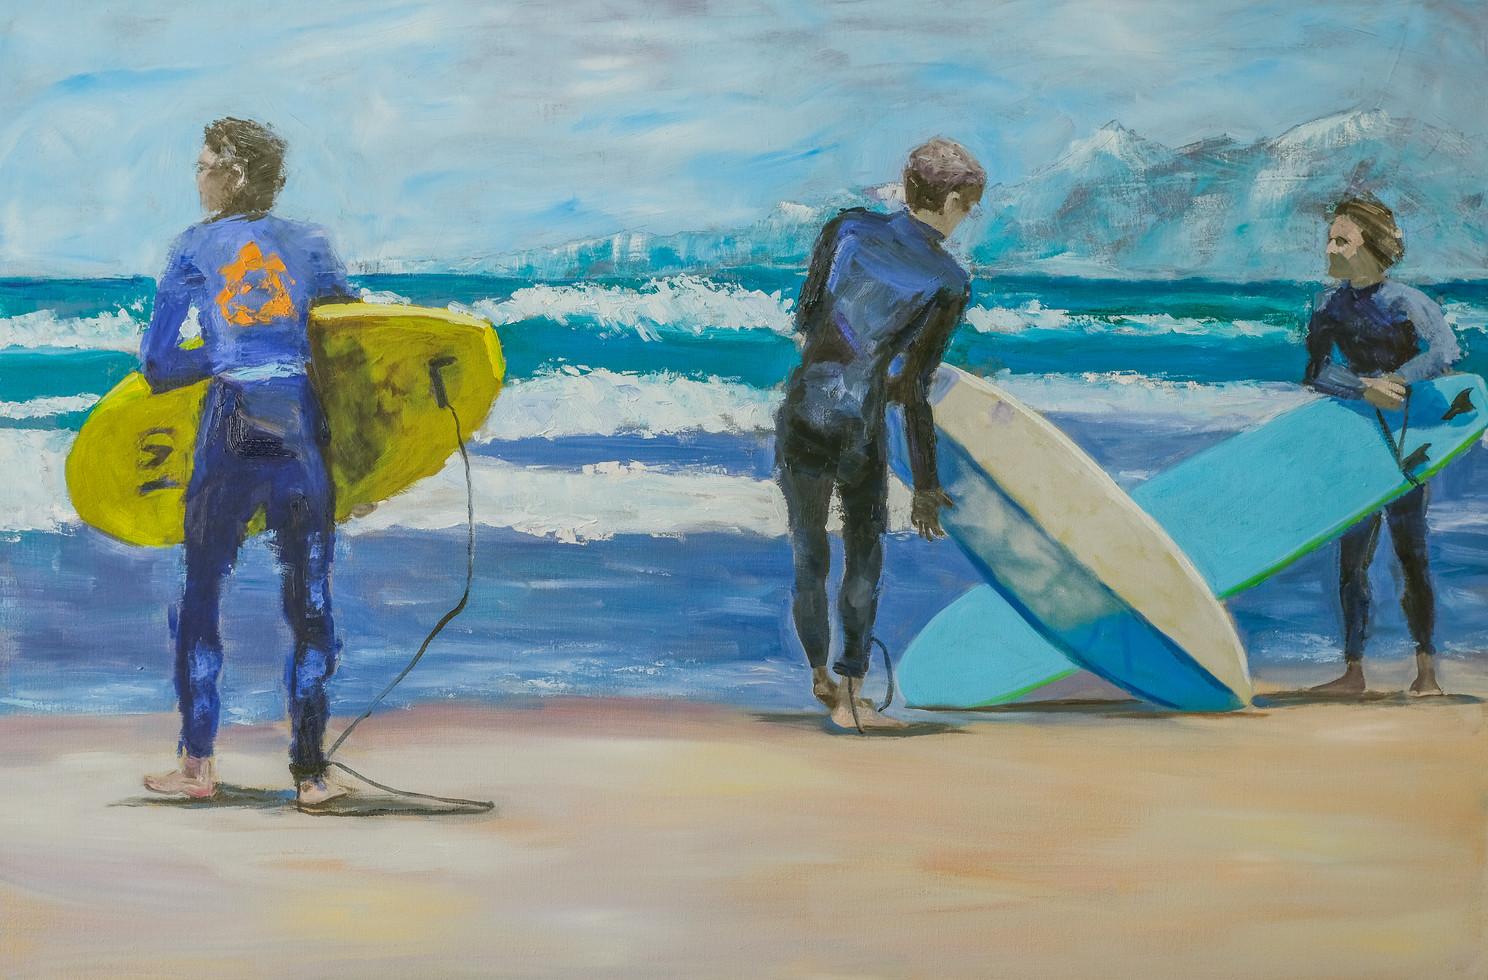 West Coast Surfers